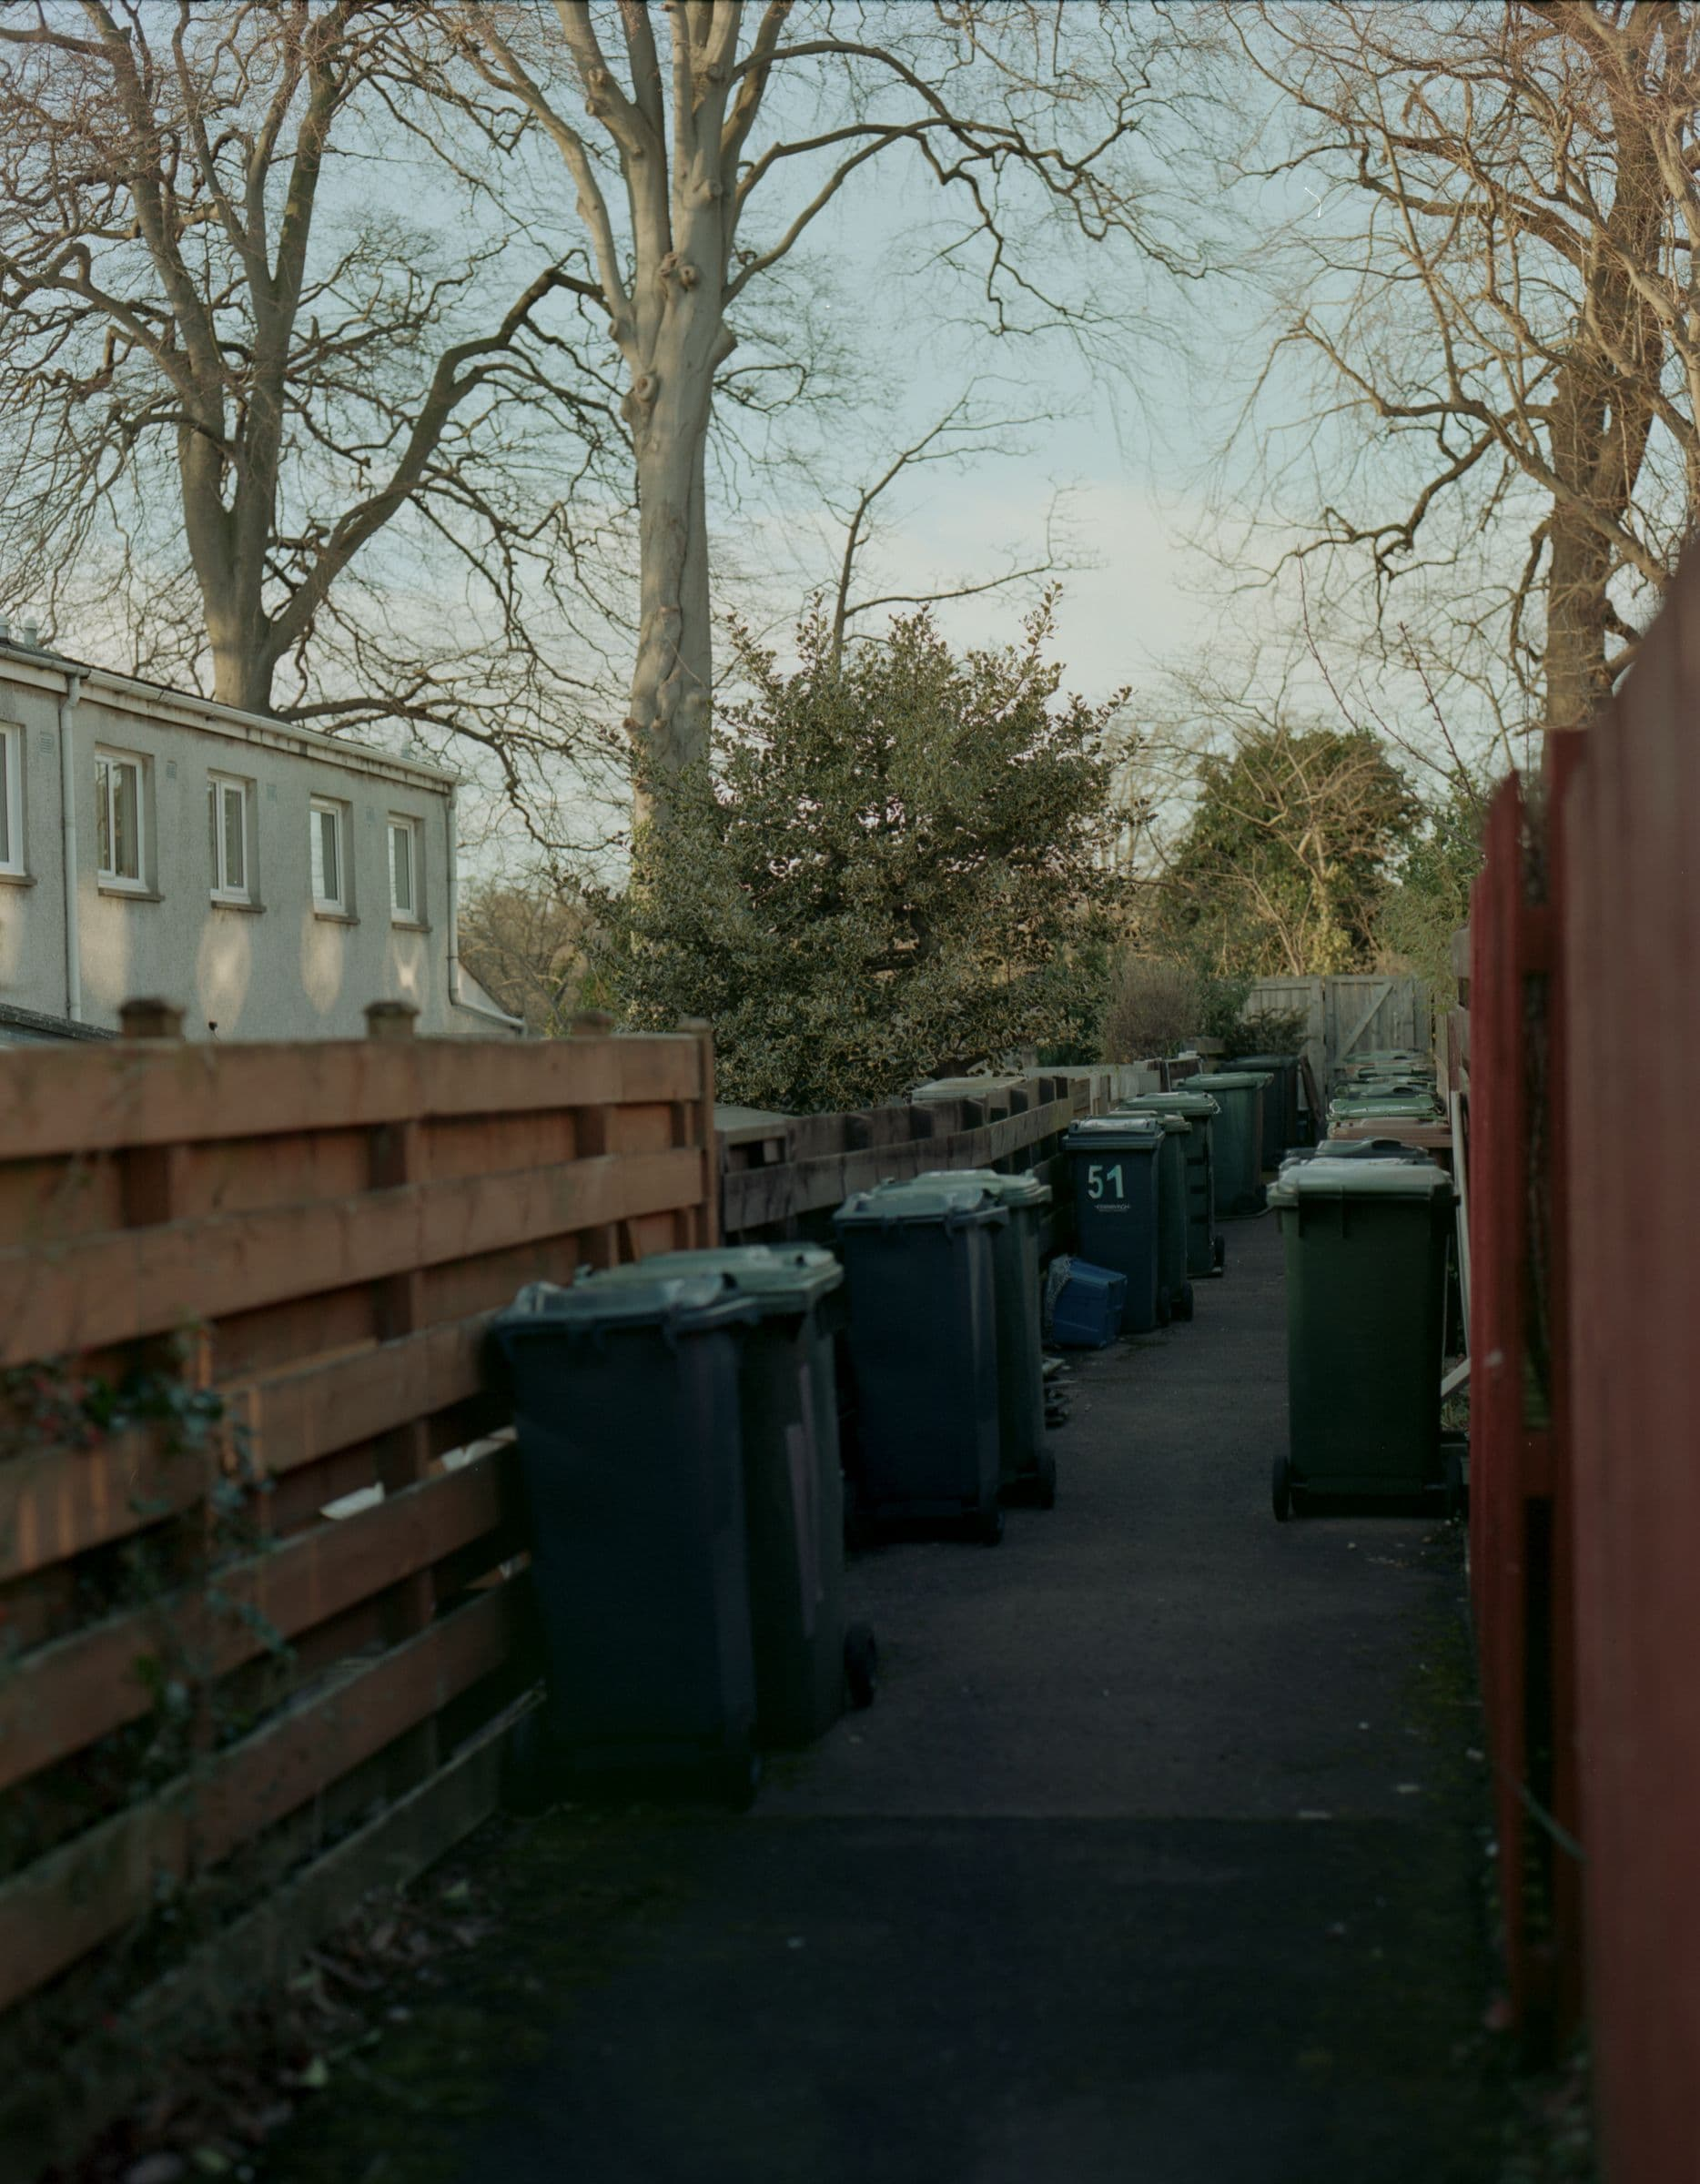 Wheelie bins crowded in a suburban alleyway at last light